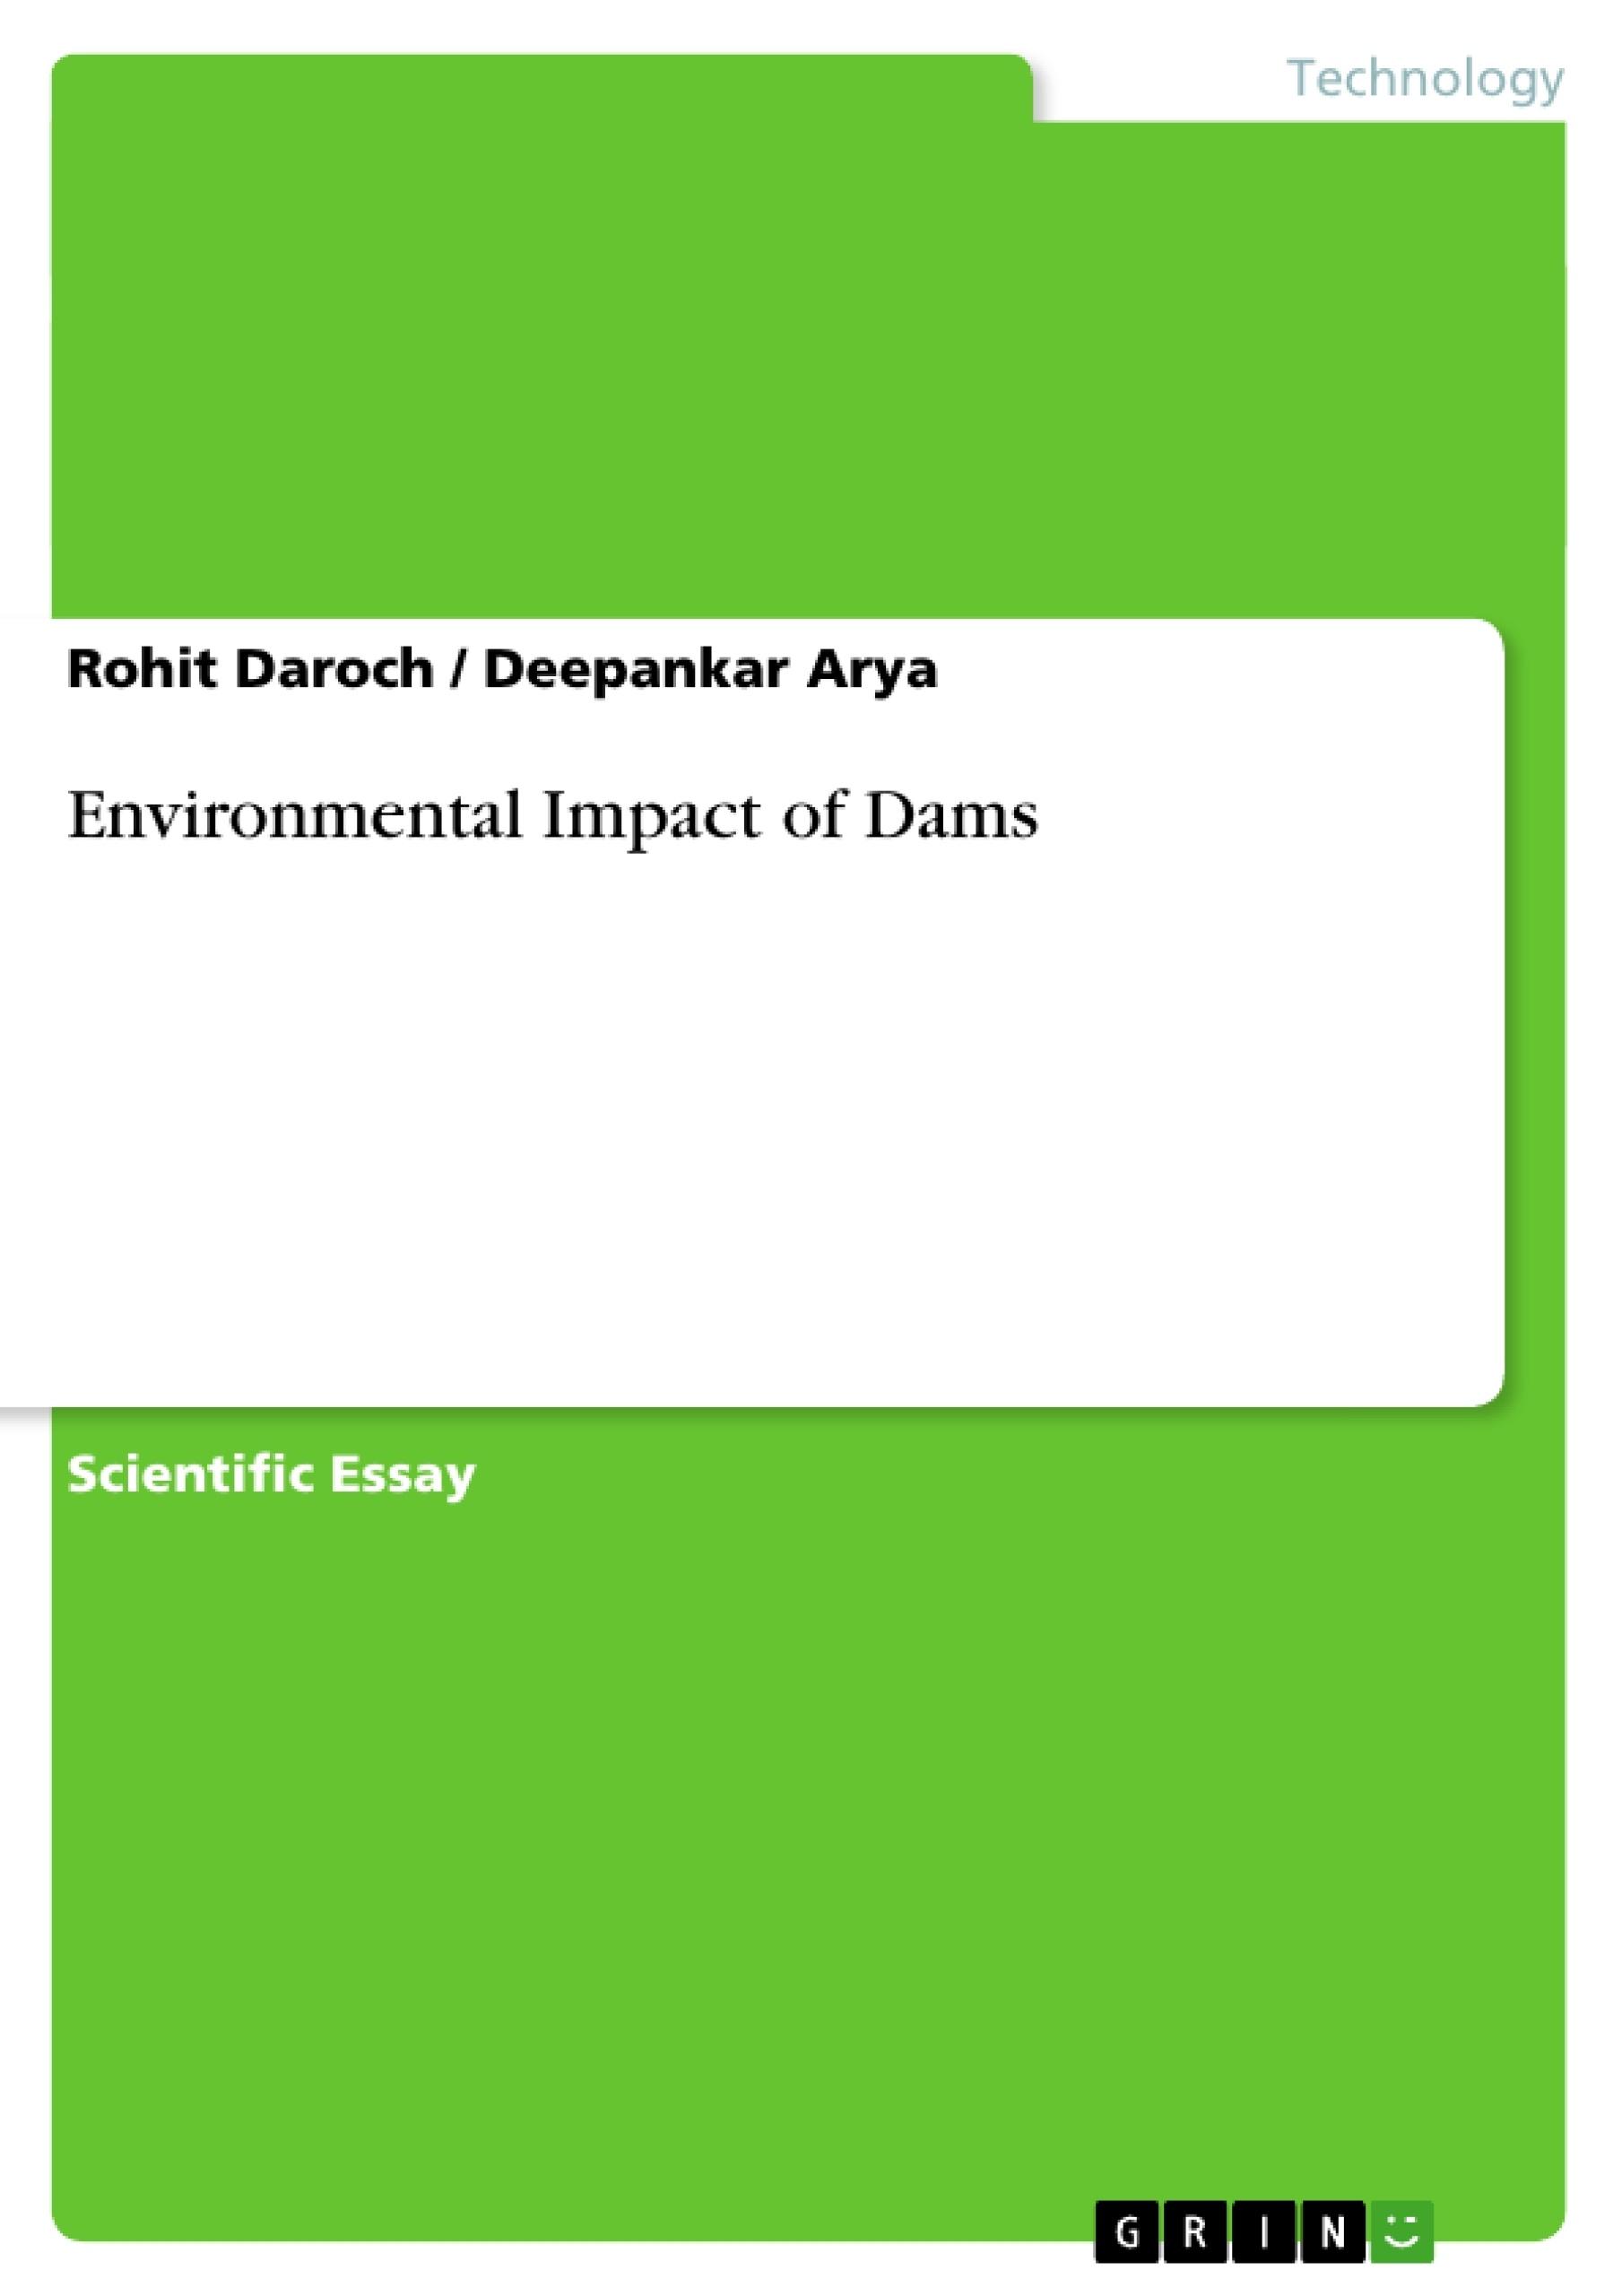 Title: Environmental Impact of Dams